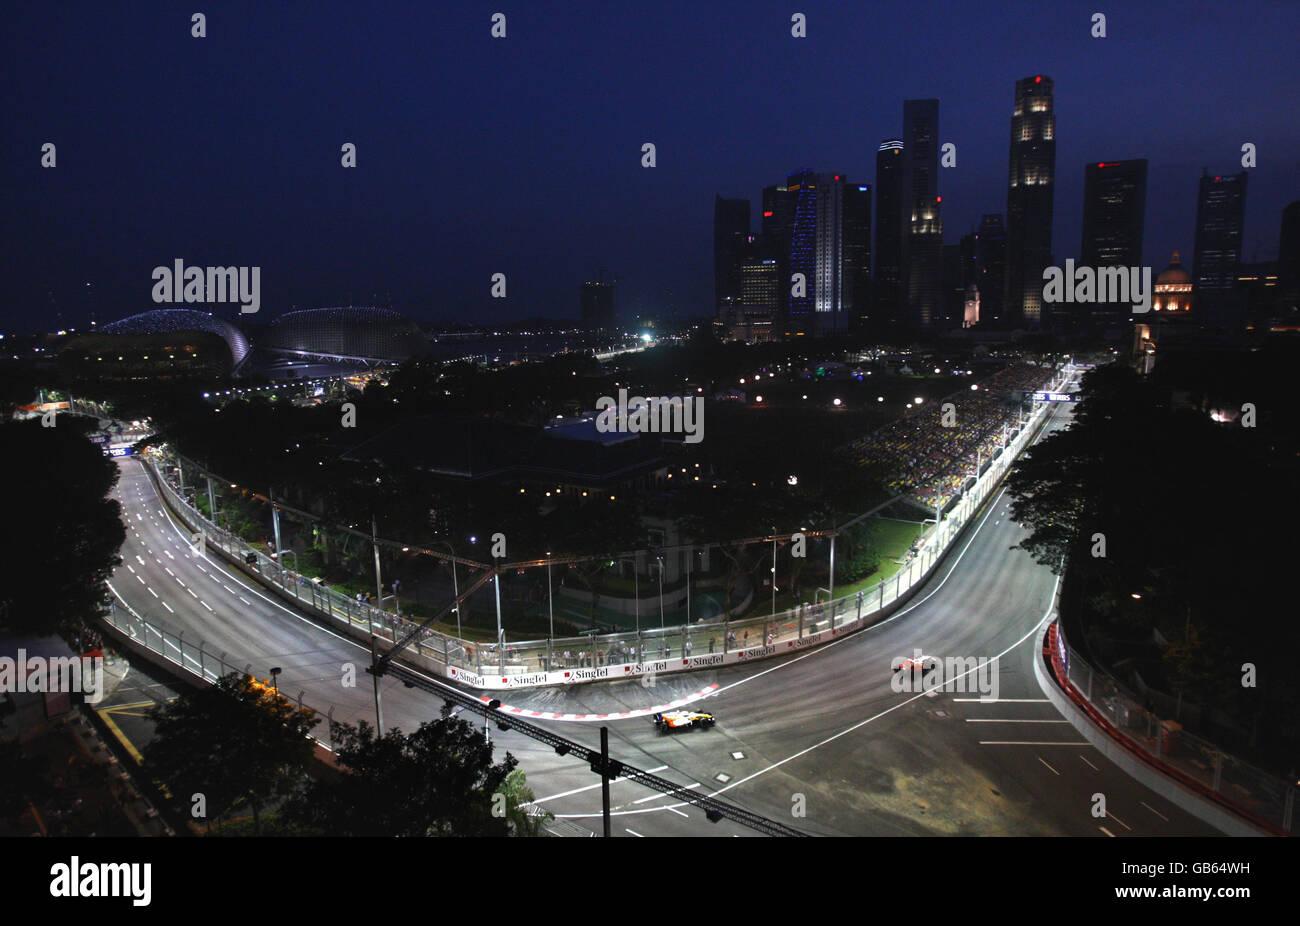 Circuito Singapur : Automovilismo fórmula 1 singtel gran premio de singapur